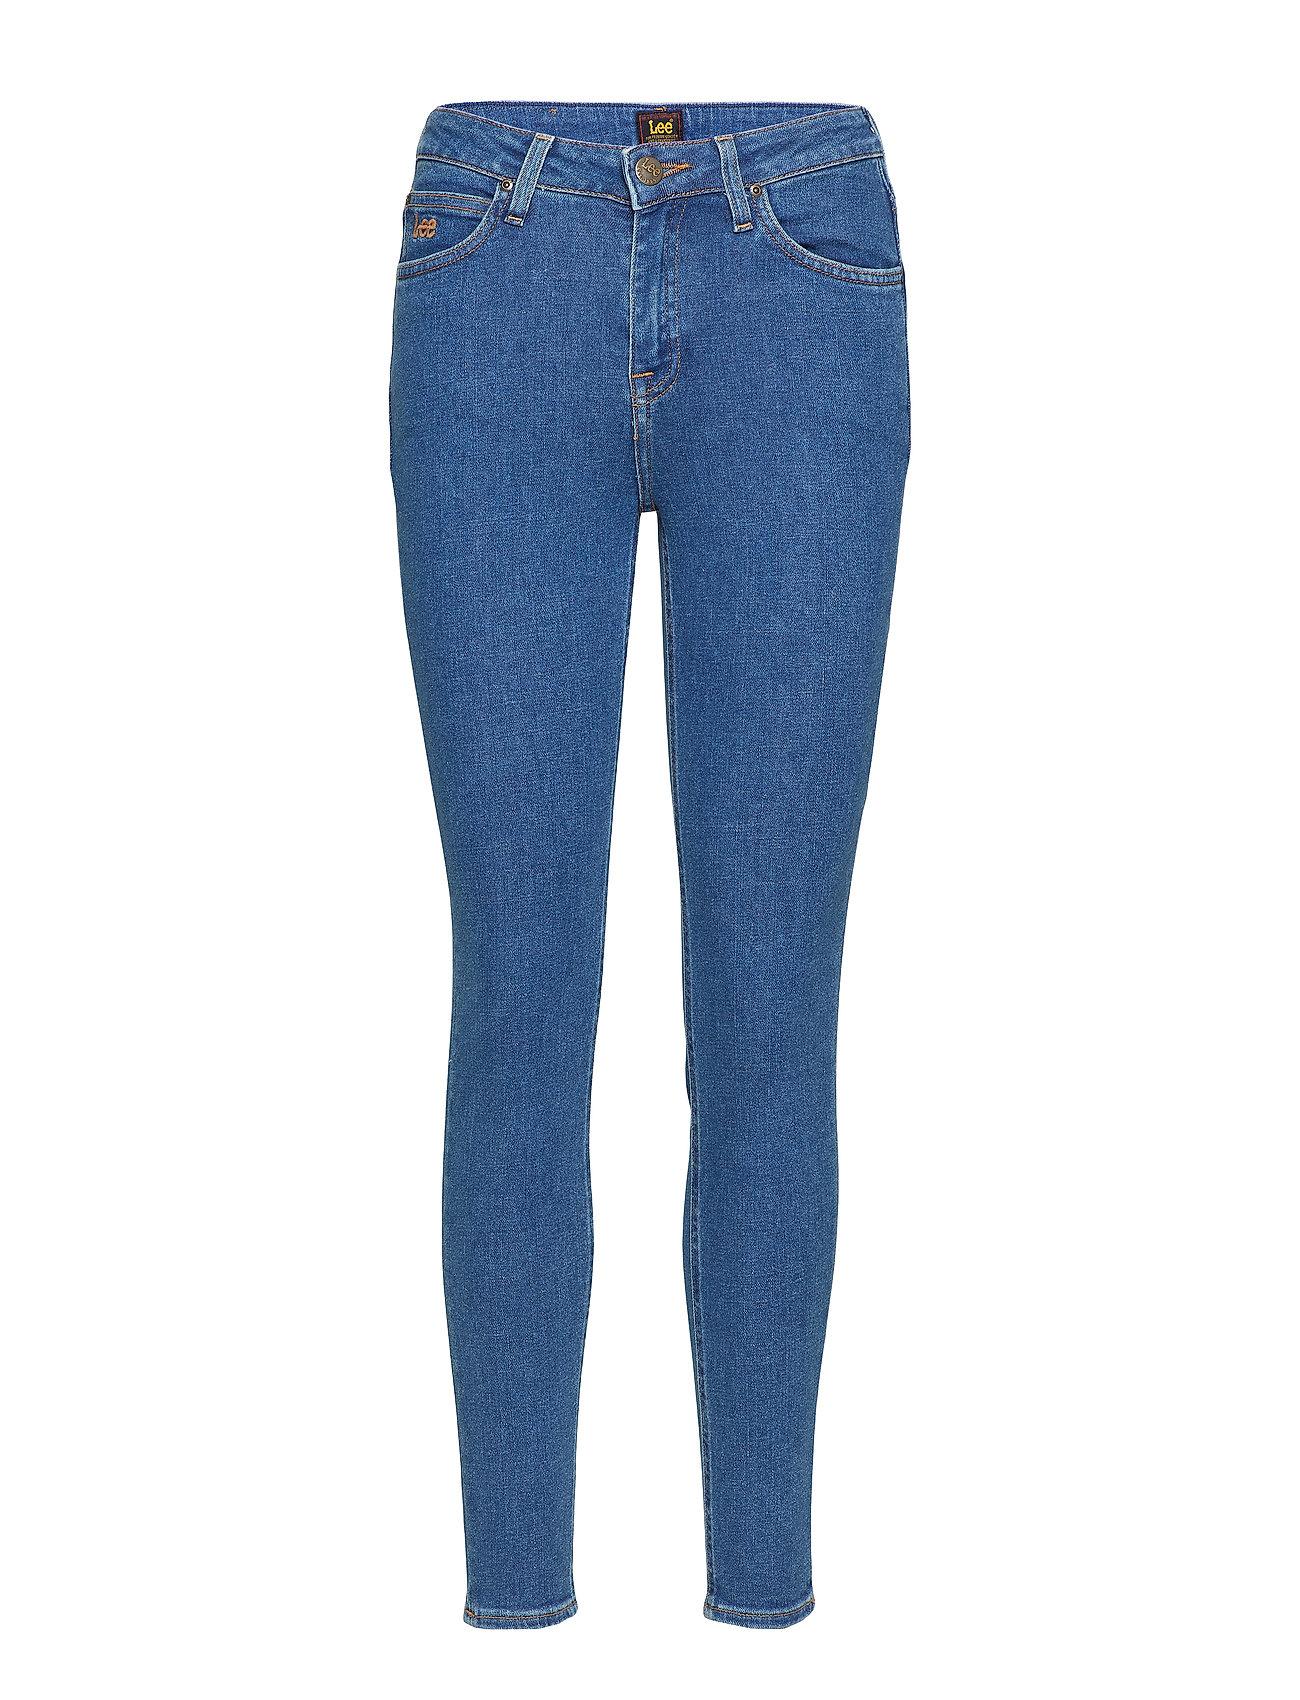 160170b5775 Scarlett High (Flat Stone) (£59.50) - Lee Jeans -